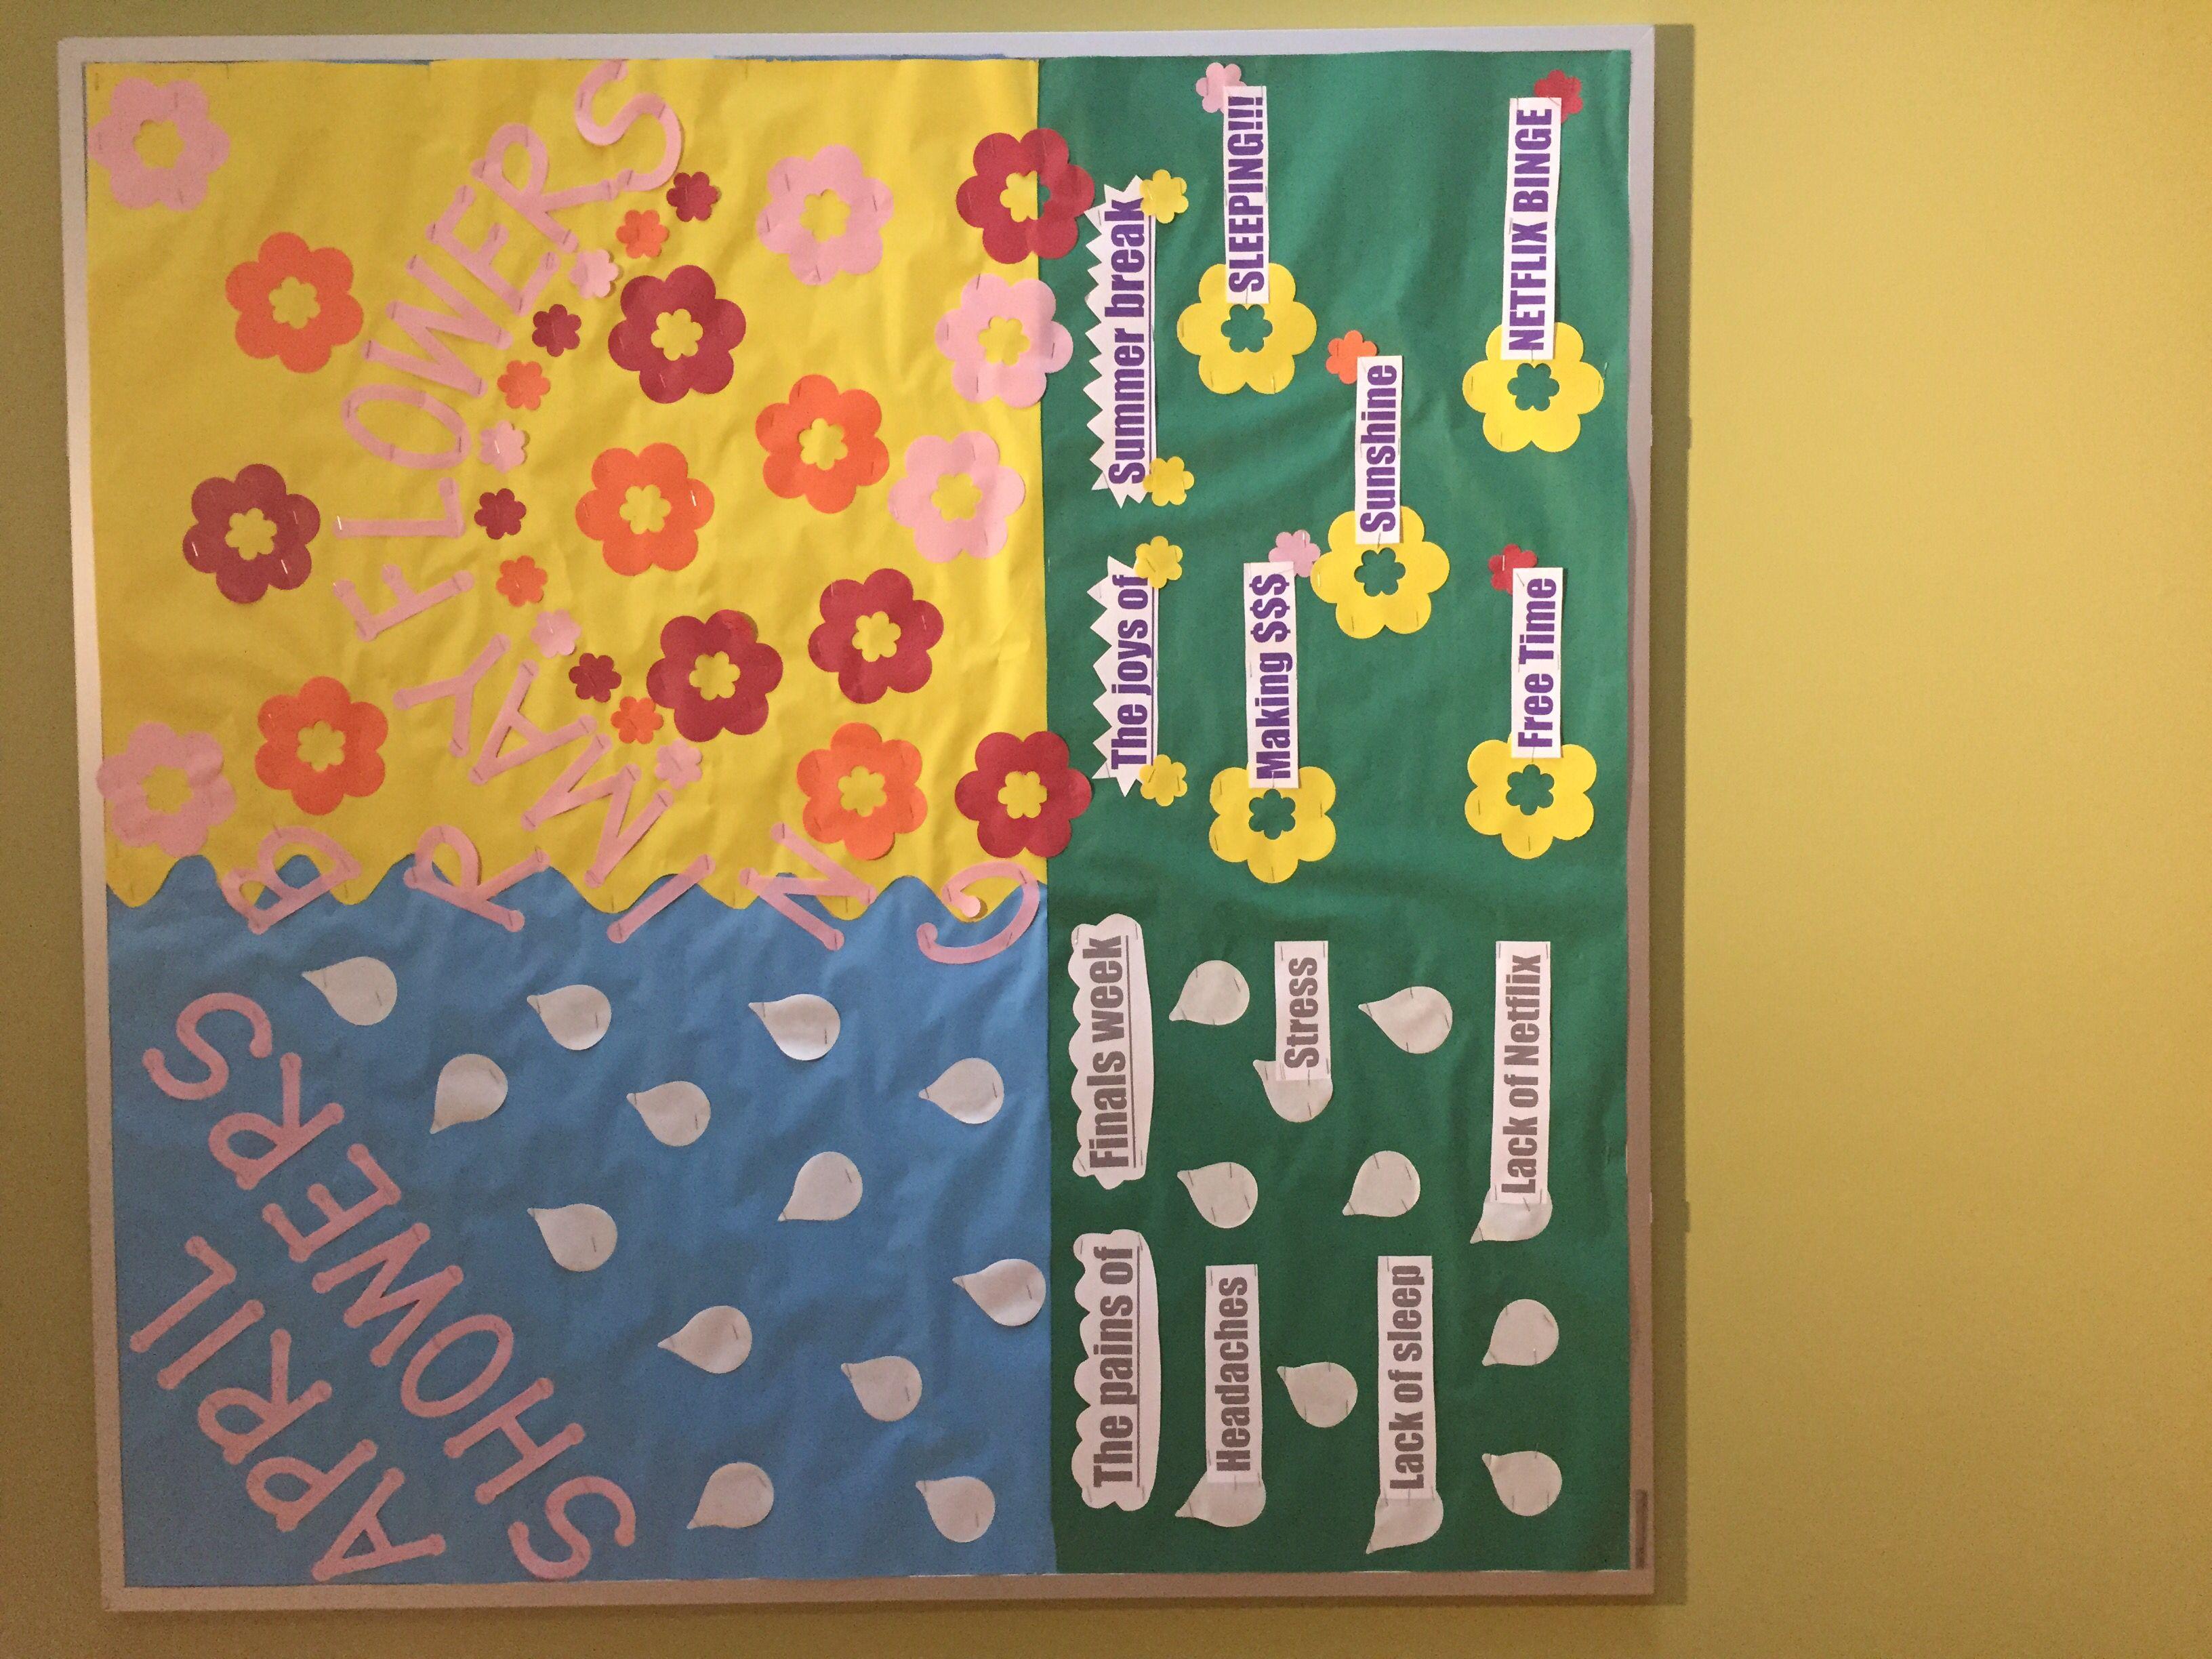 Spring time motivational bulletin board for RAs